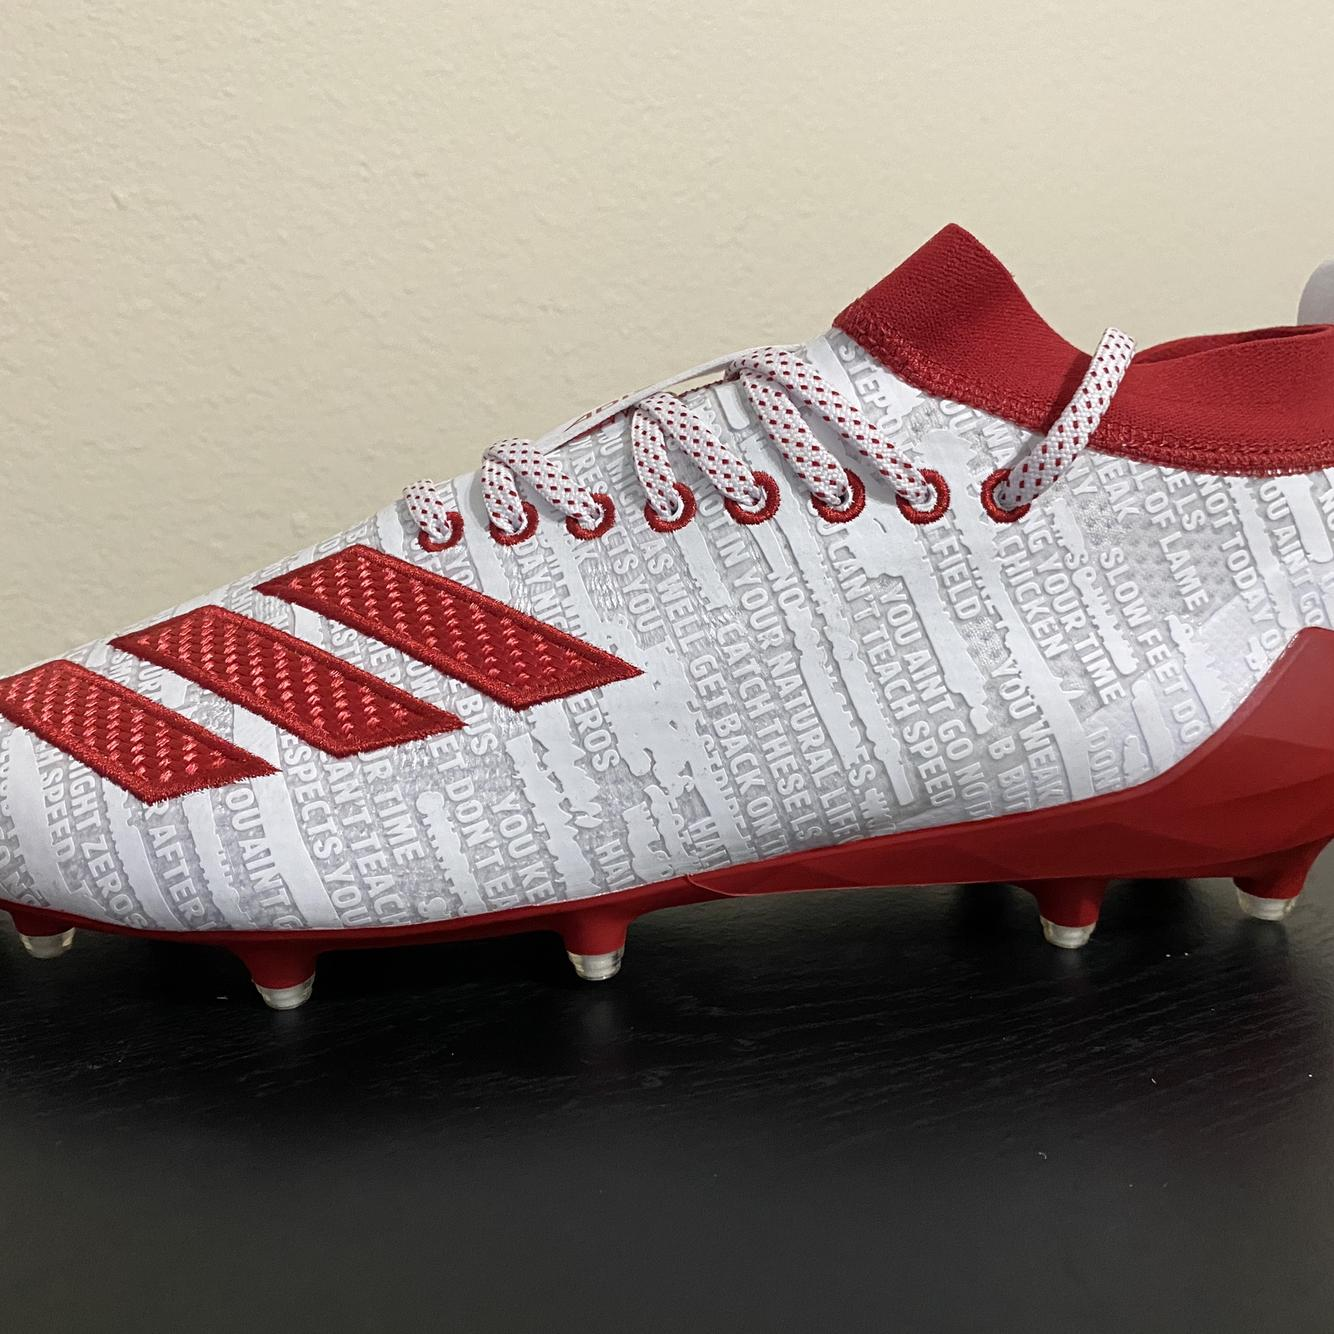 Adidas Adizero 8.0 Men's Size 12